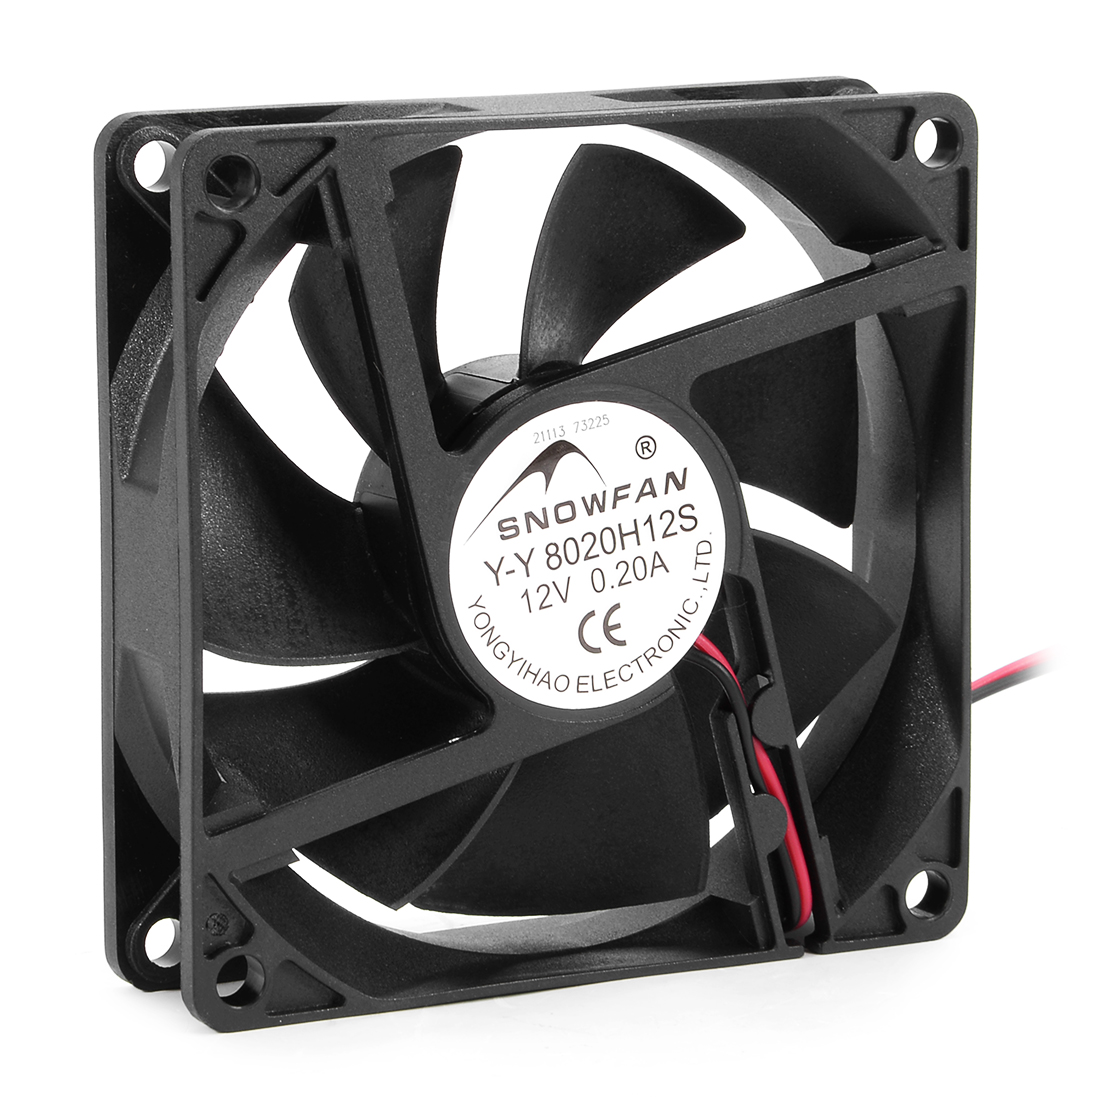 80mm x 80mm x 20mm 12V DC Cooling Fan Long Life Sleeve Bearing Computer Case Fan